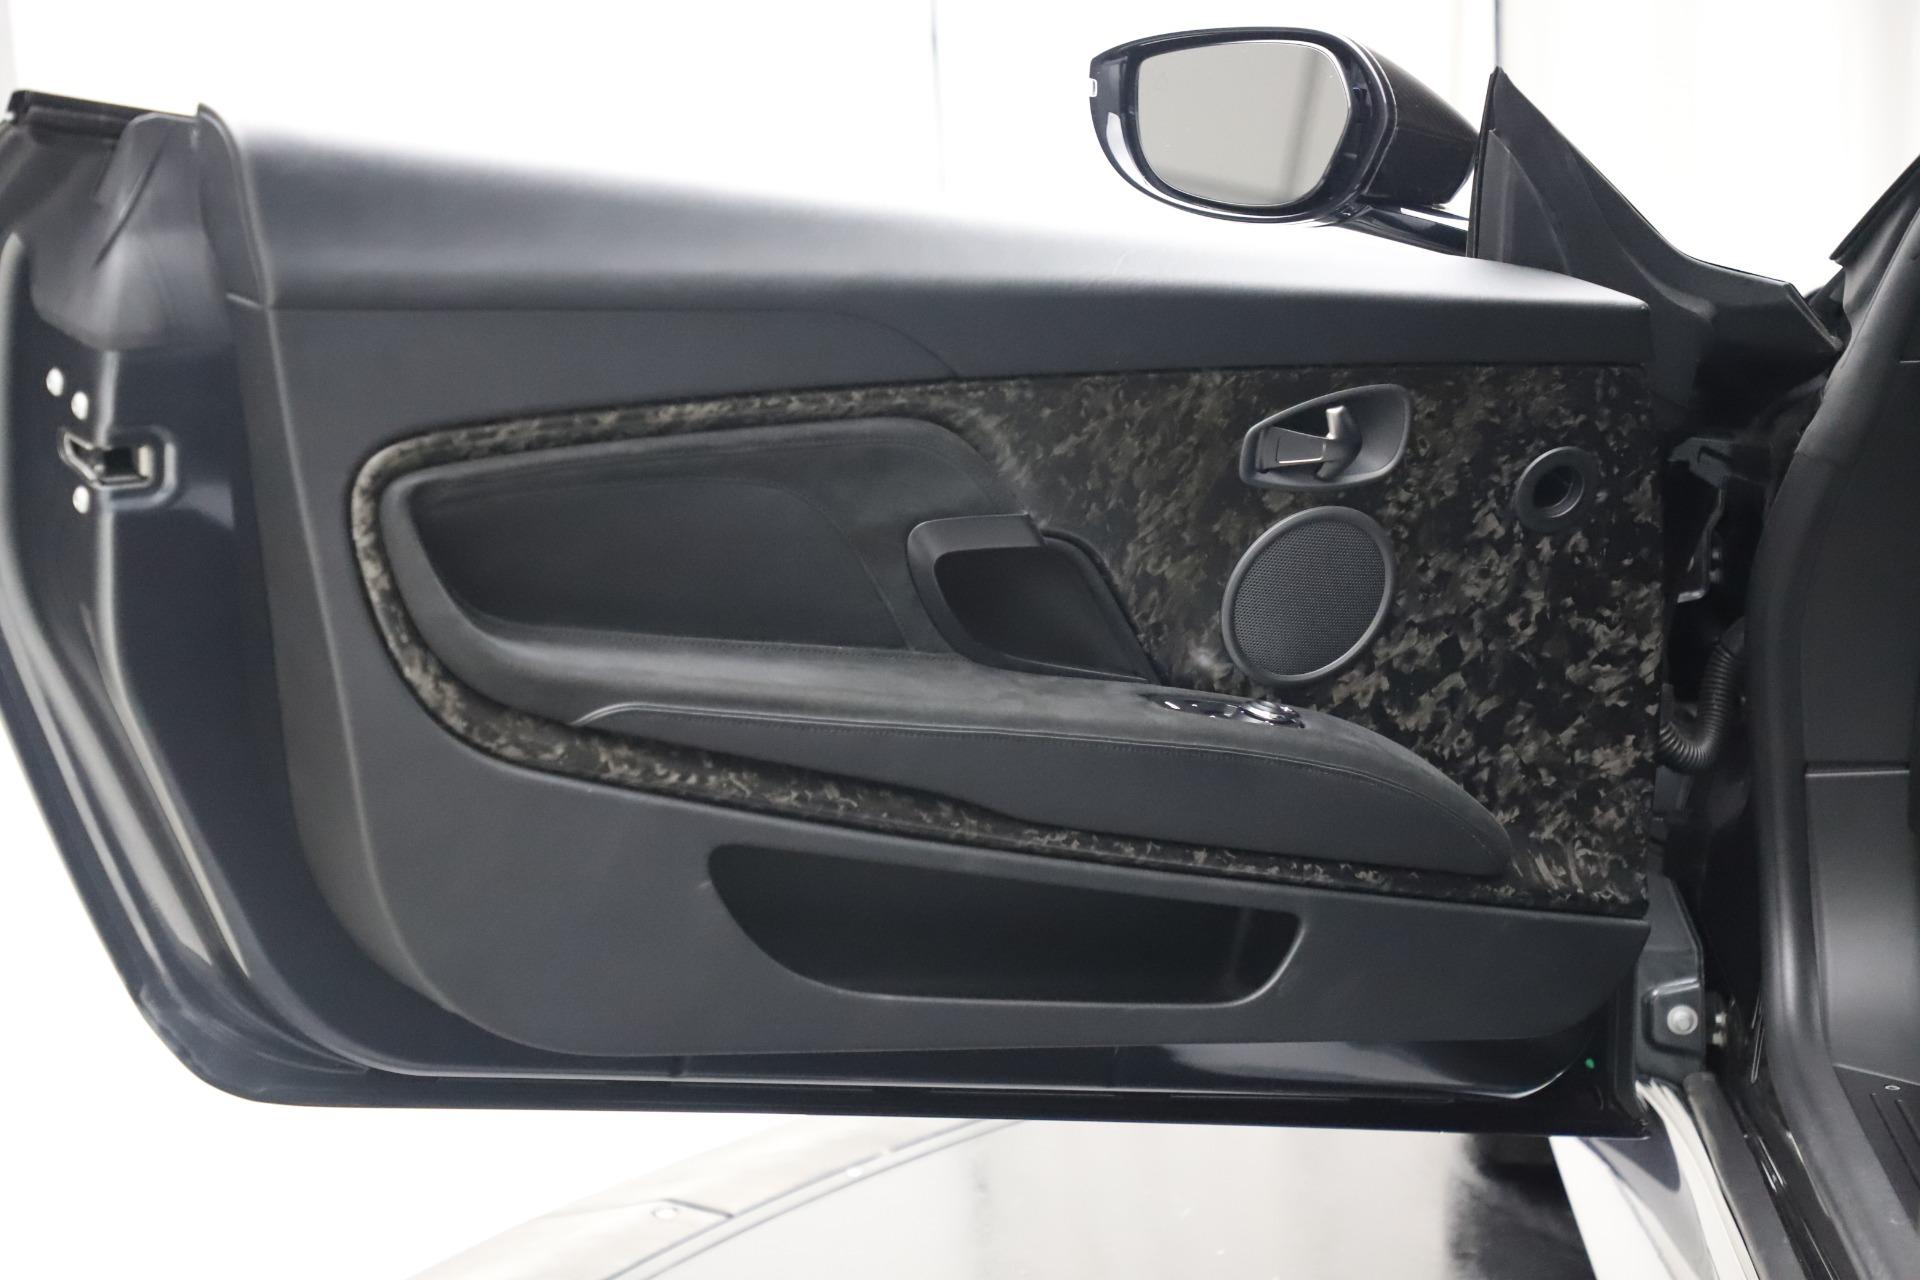 Used 2019 Aston Martin DBS Superleggera Coupe For Sale In Westport, CT 3570_p20